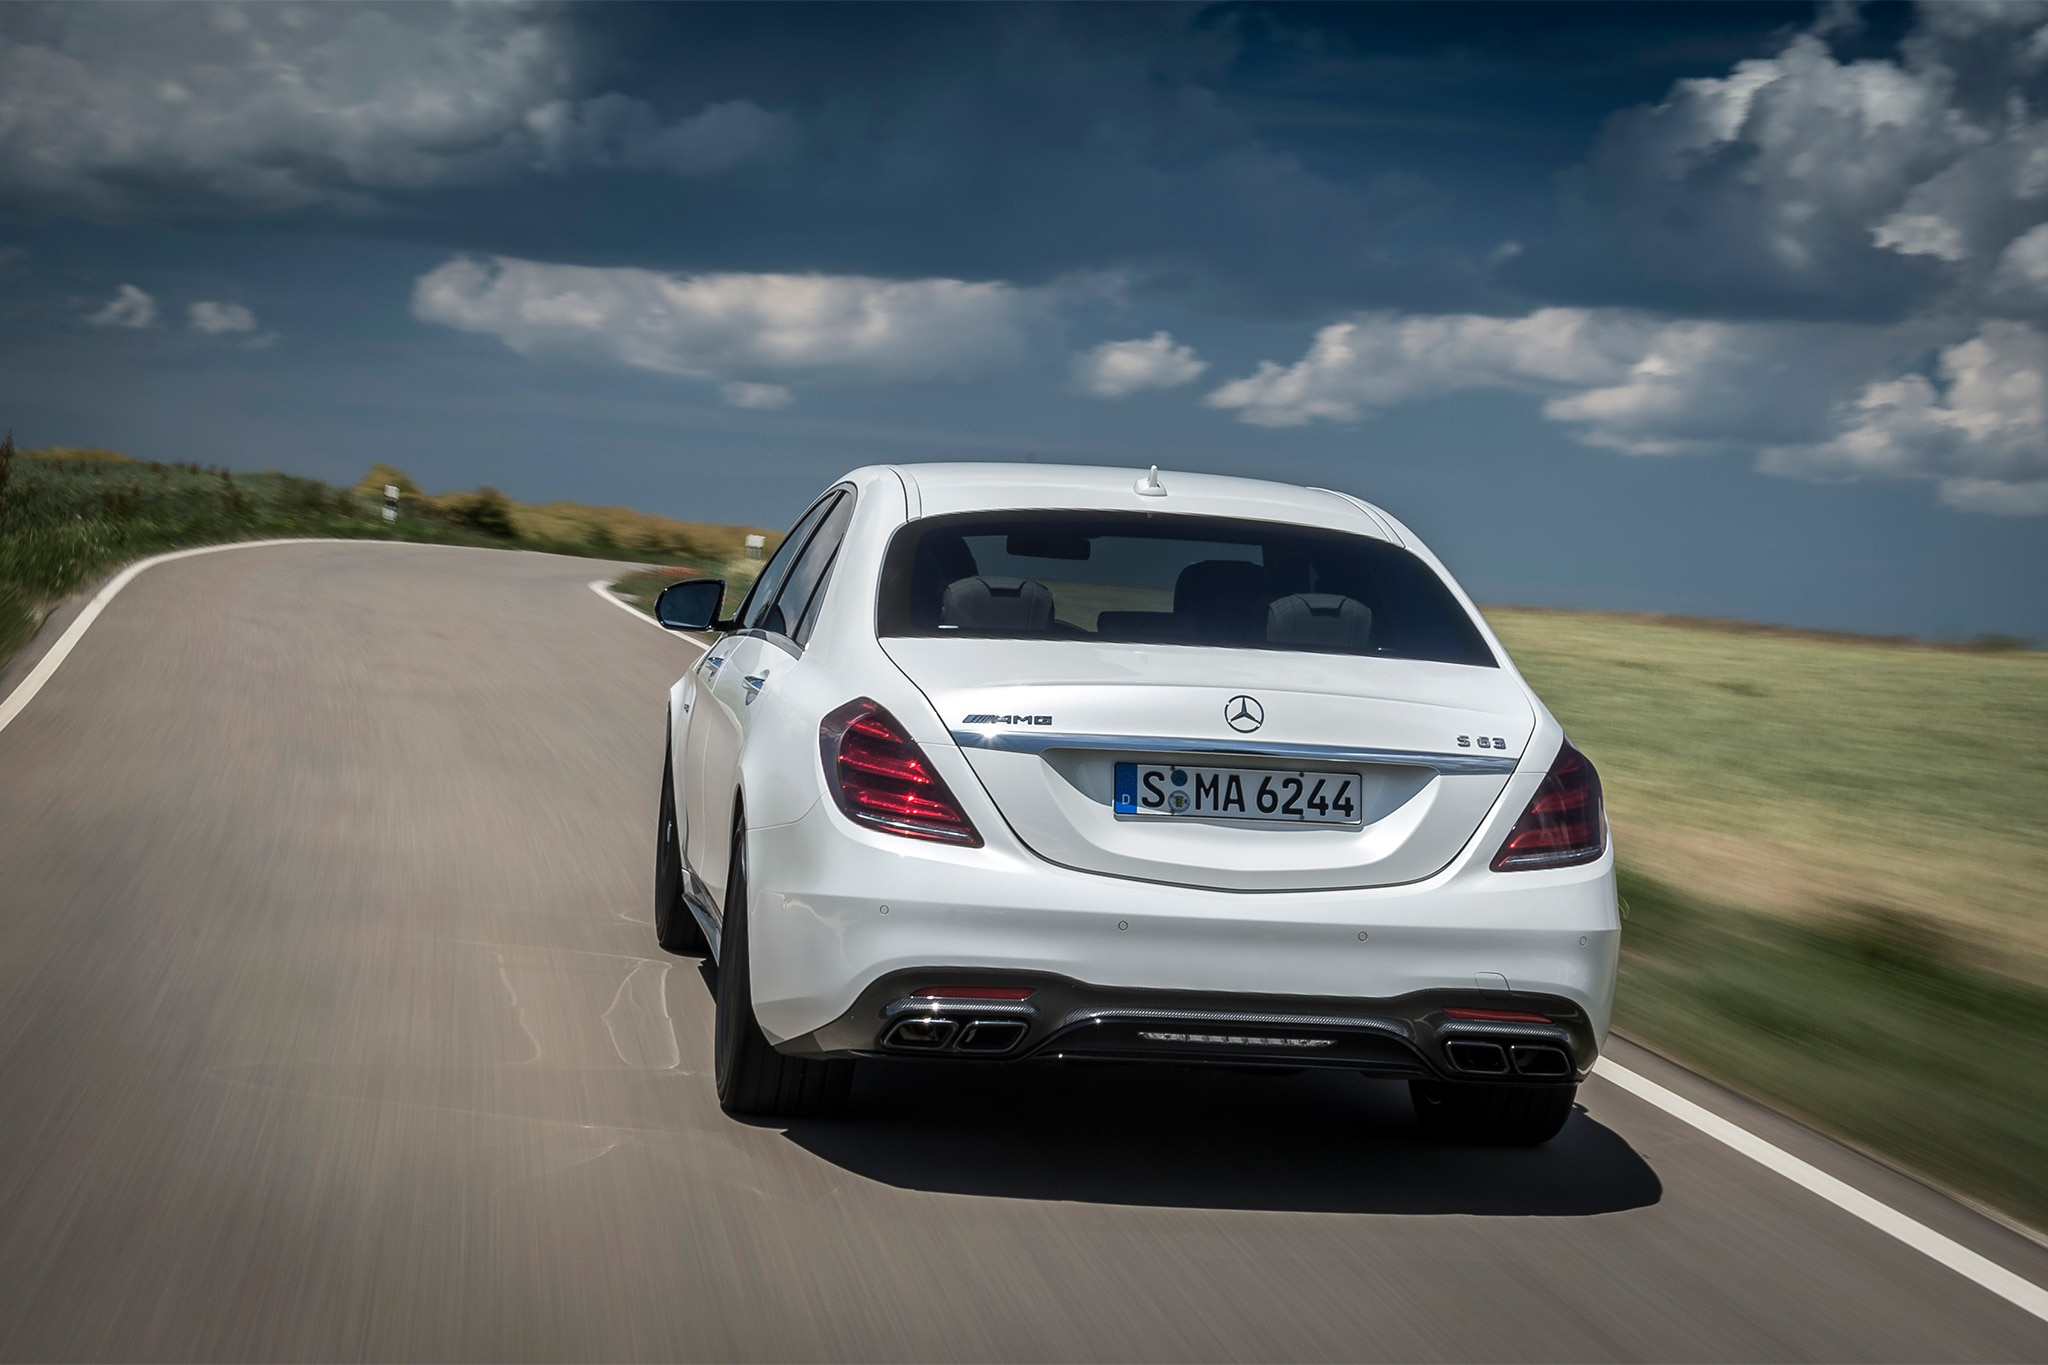 first drive: 2018 mercedes-benz s-class | automobile magazine